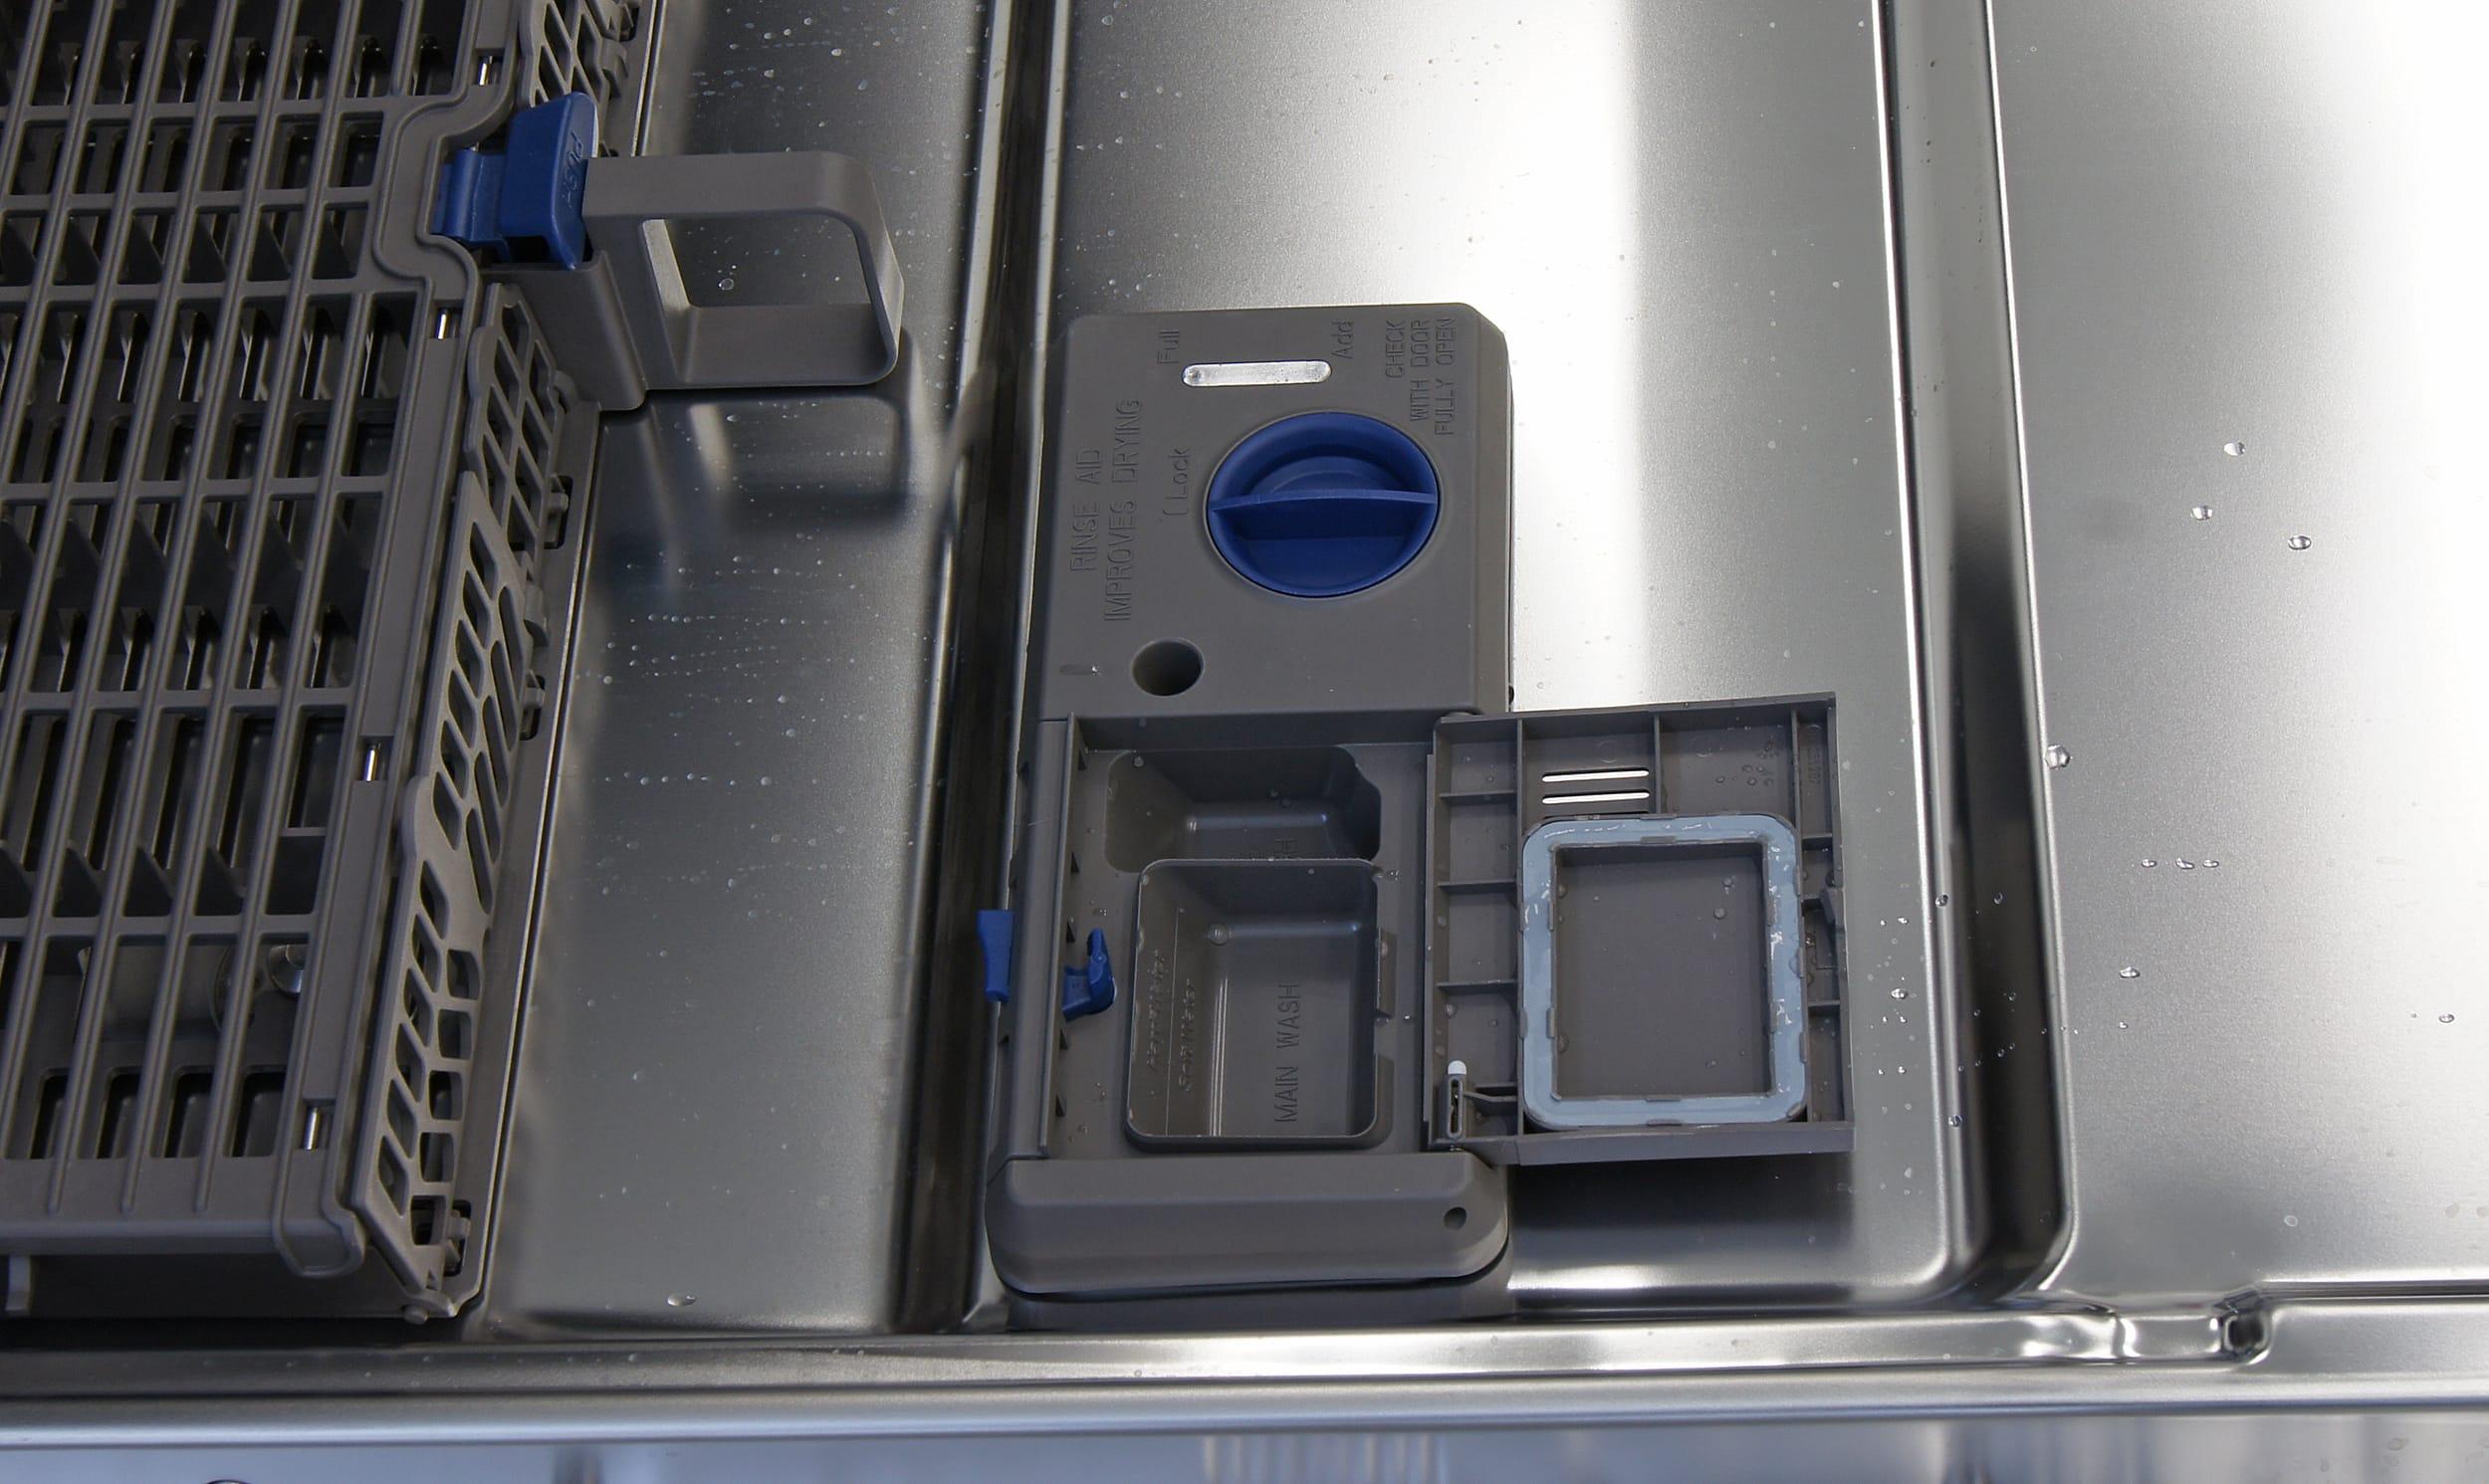 Whirlpool detergent dispenser